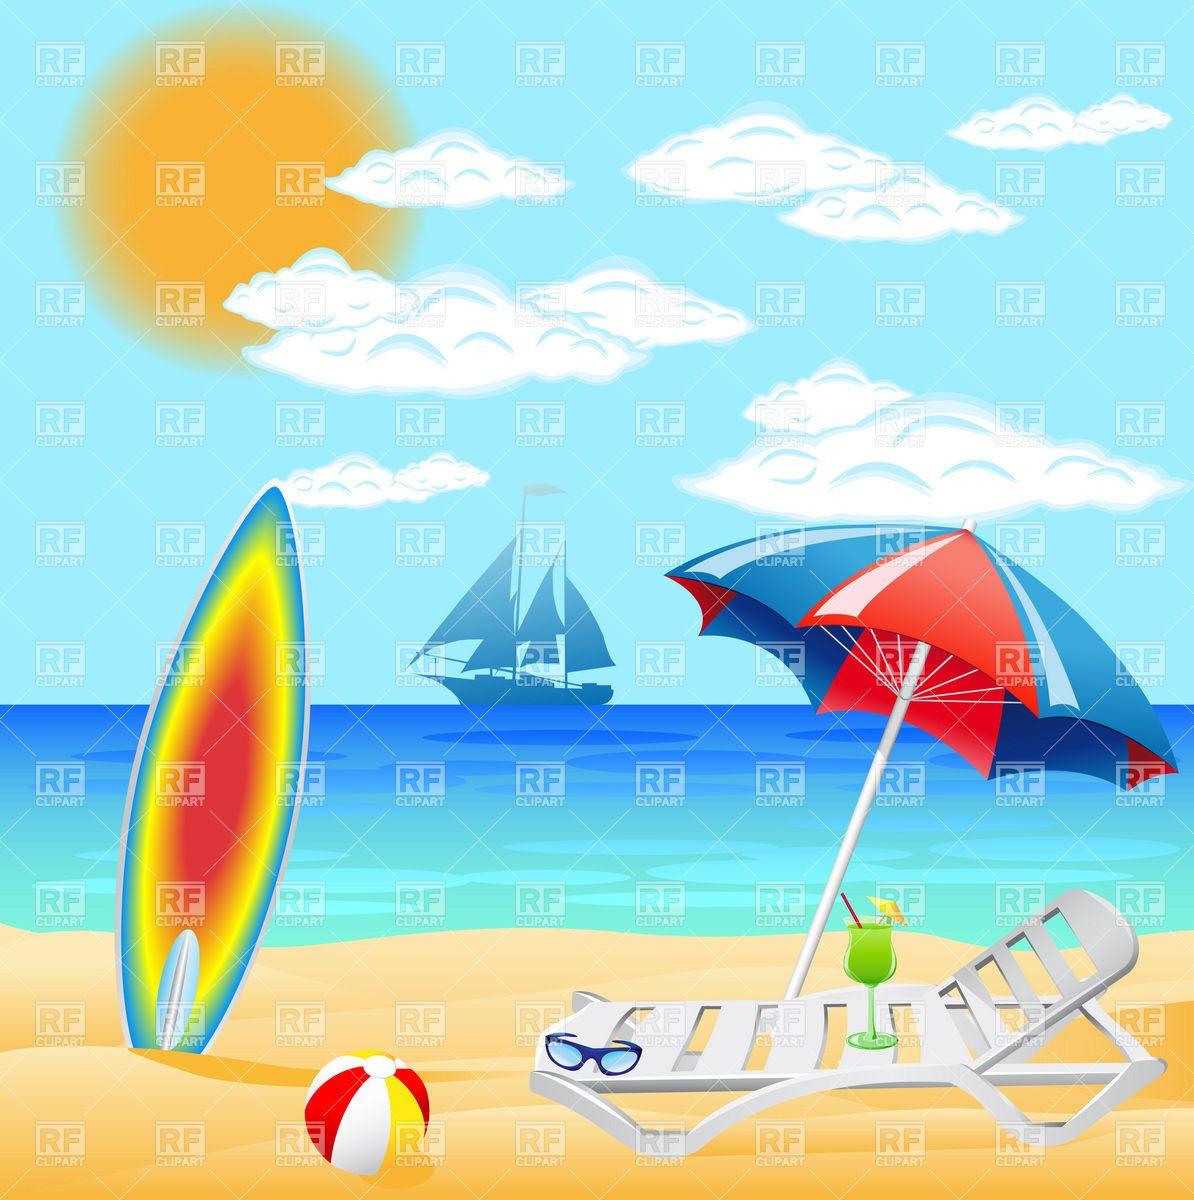 Beach Vacation Clip Art Pics Photos Summer Vacation Clip Art Images Summer Vacation Stock Beach Illustration Beach Scenes Beach Pictures